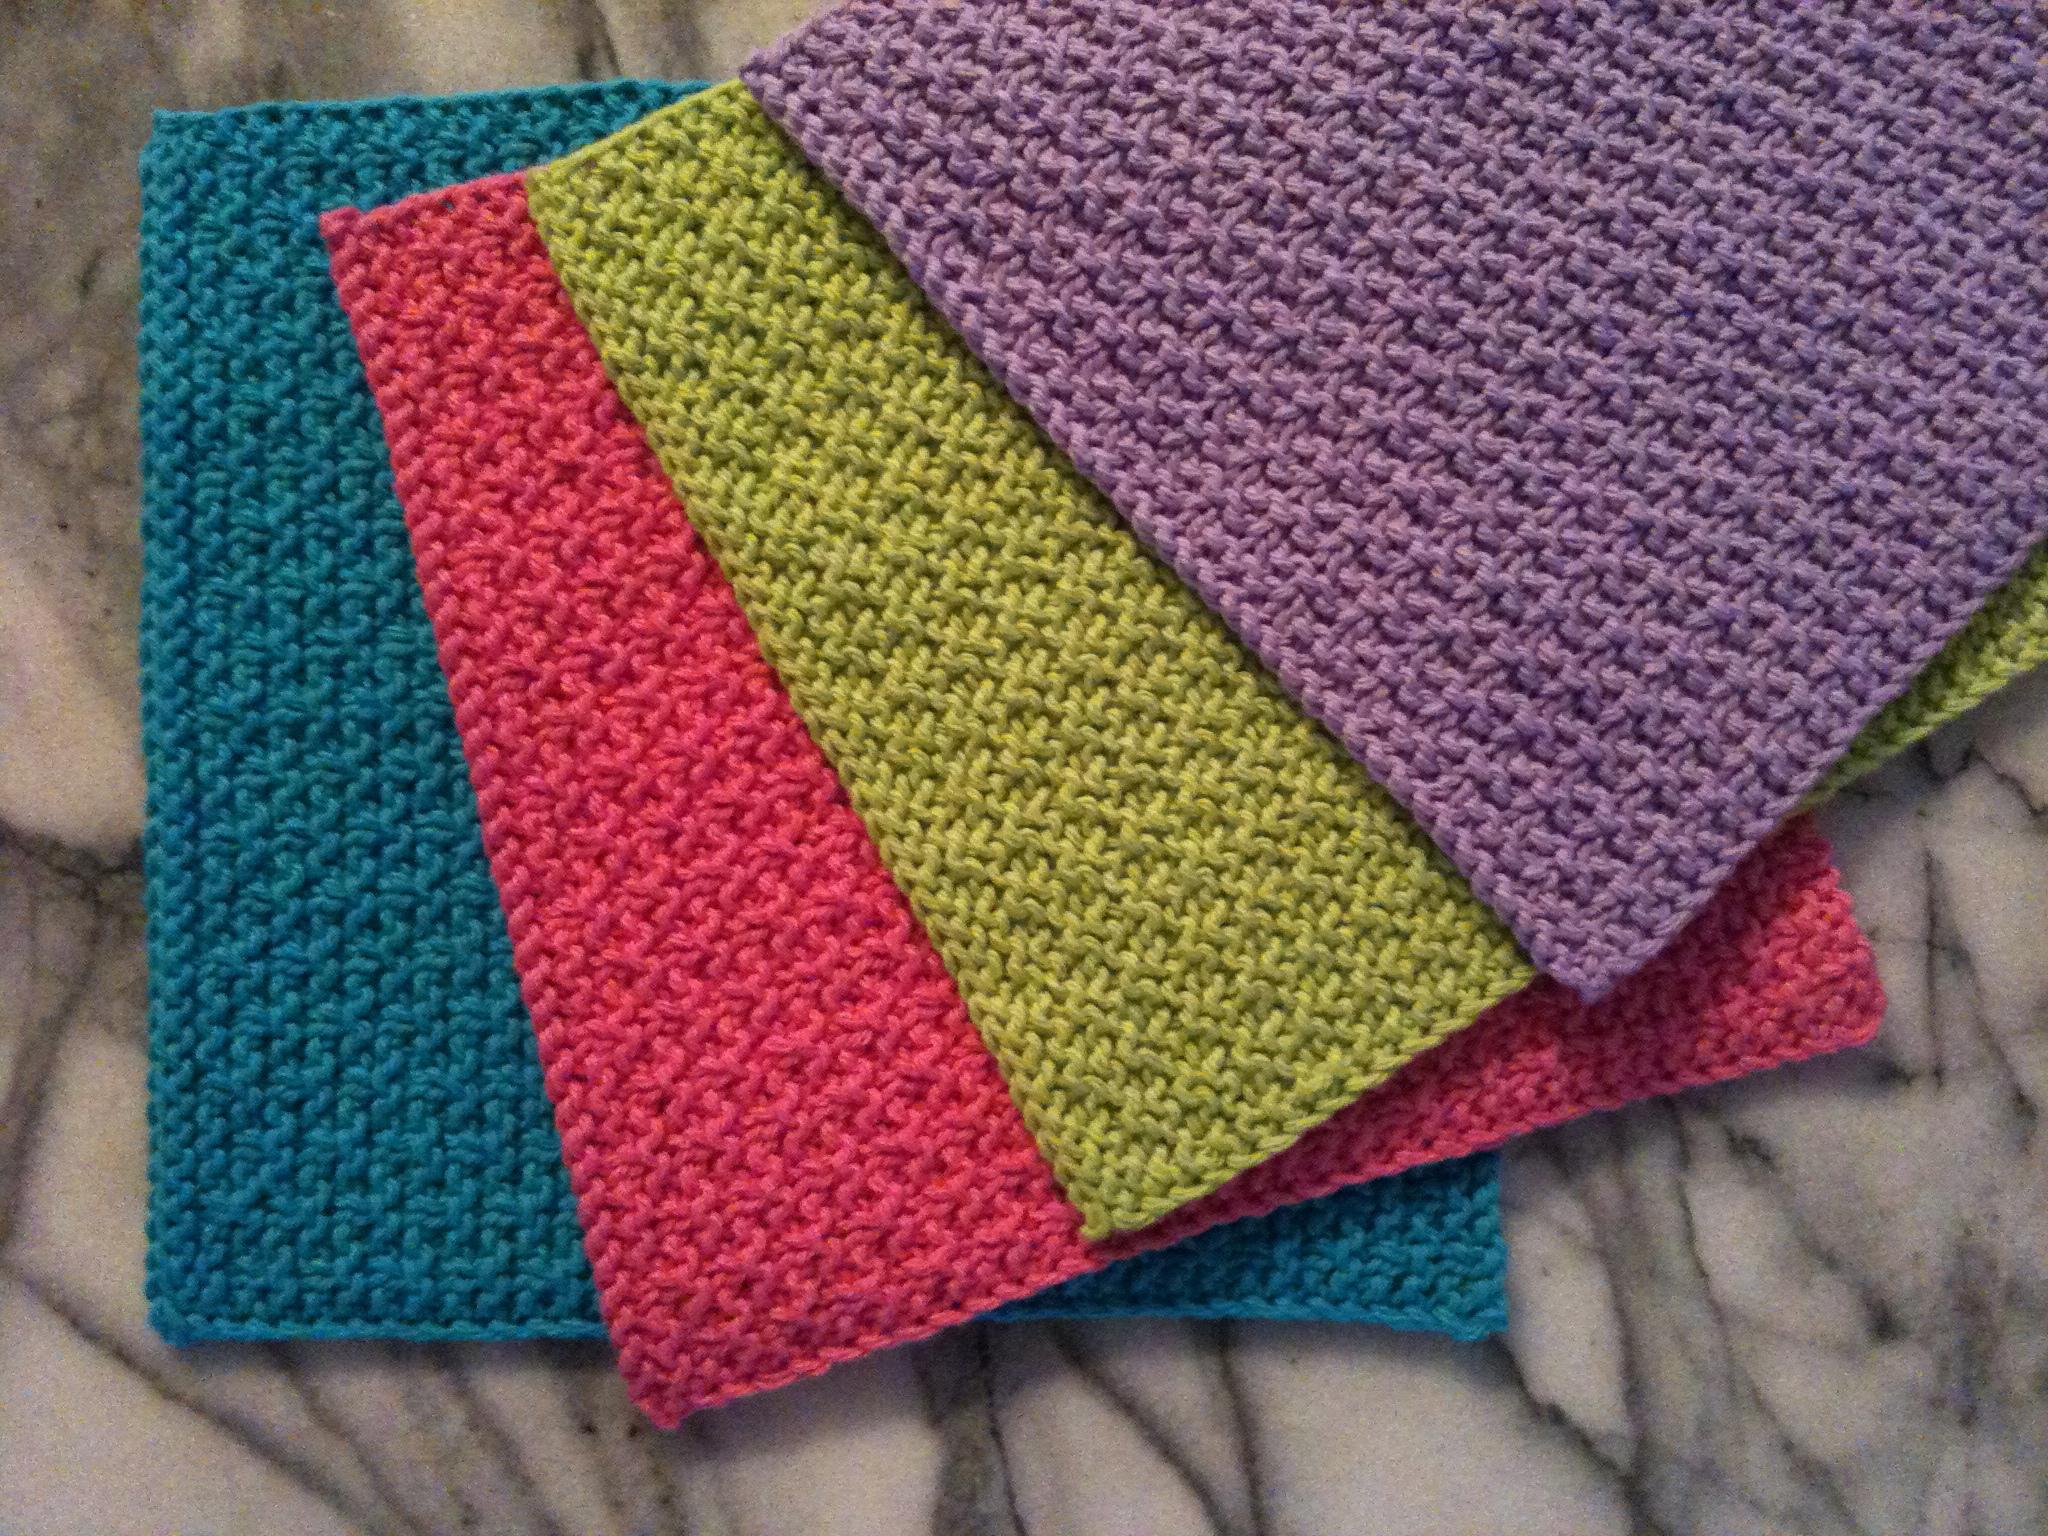 Washcloth Knitting Pattern Knitting Patterns Galore Snakes And Ladders Washcloth